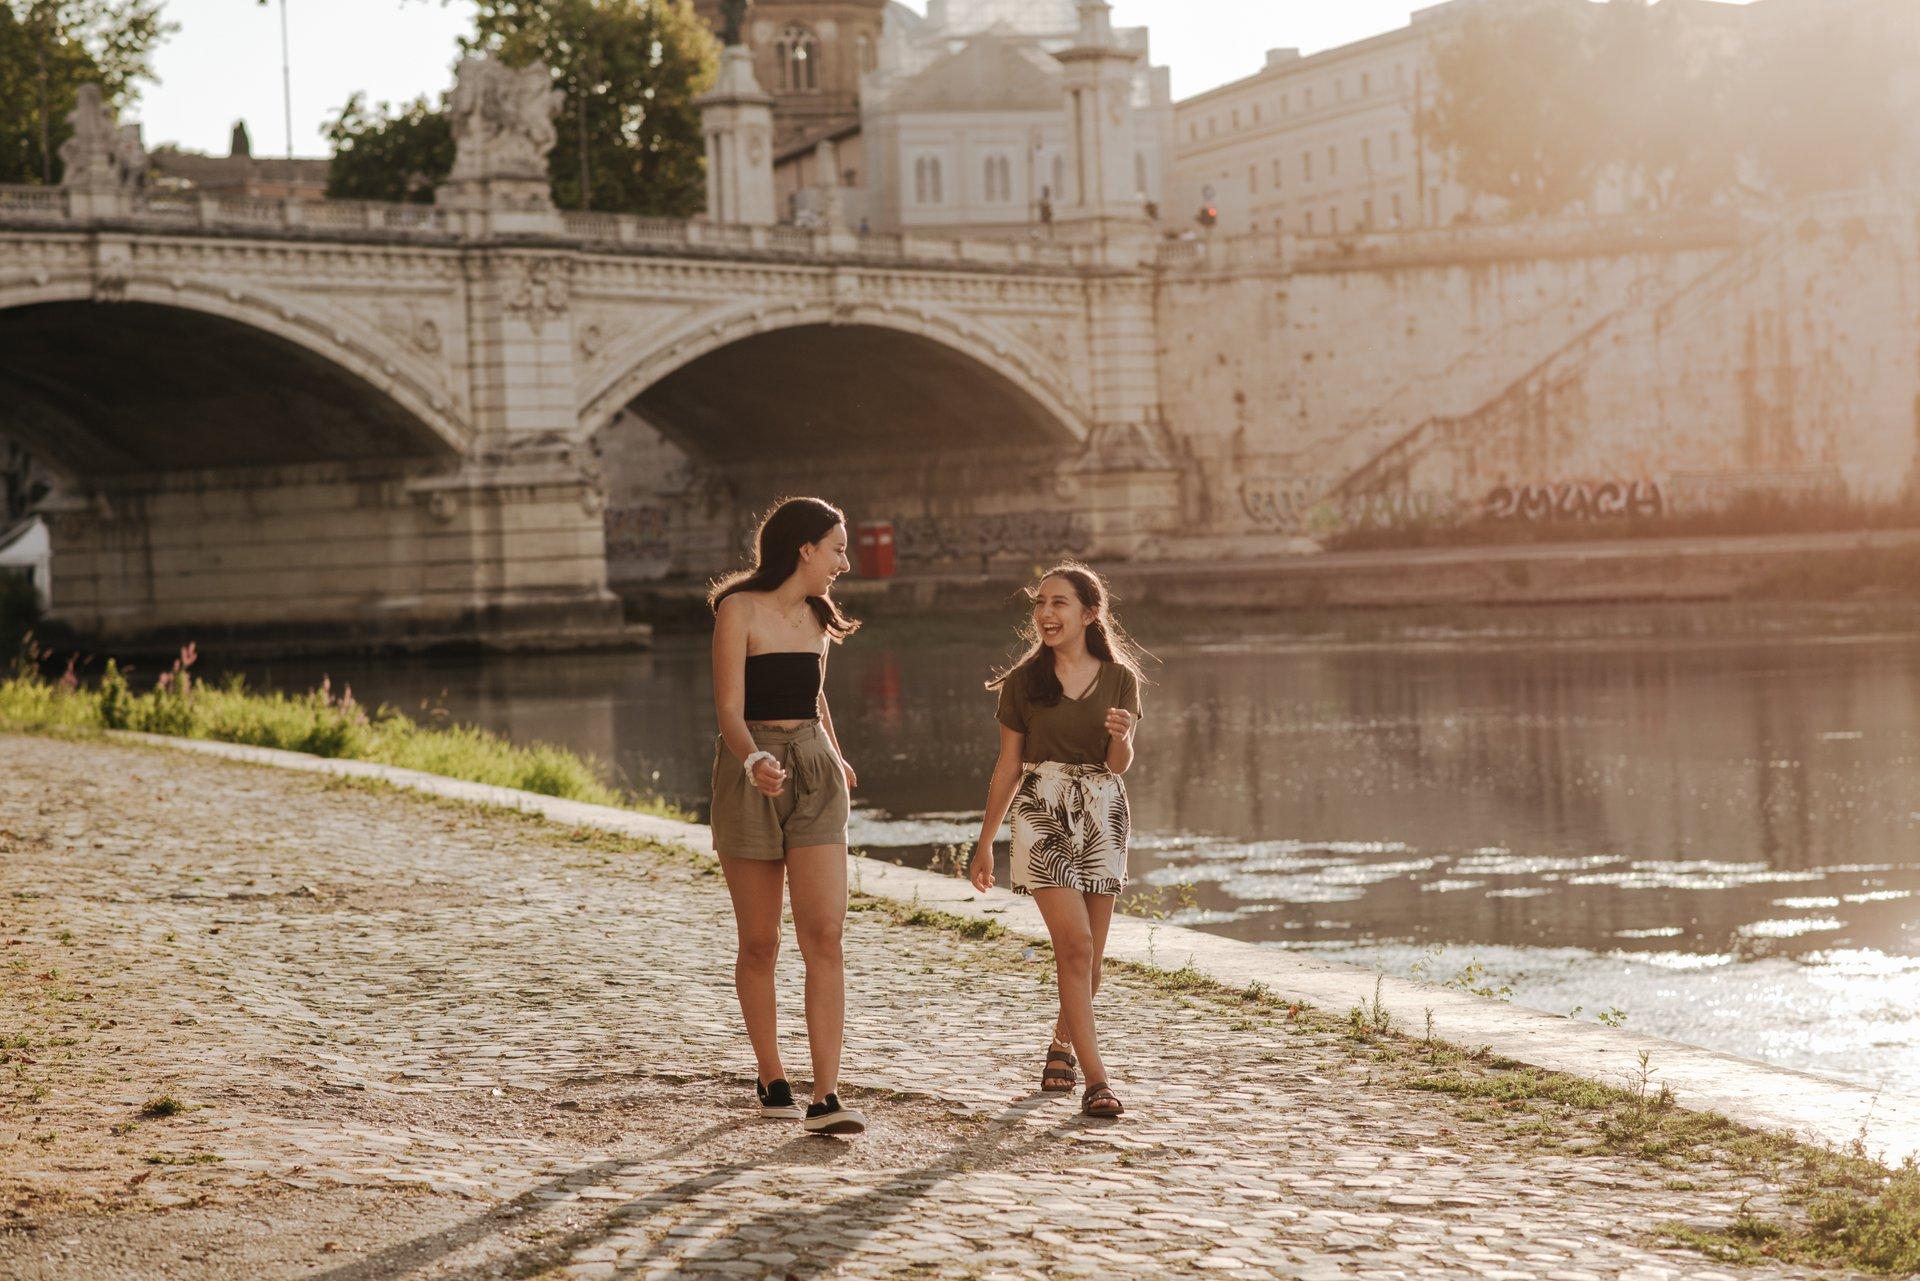 Rome-Italy-travel-story-Flytographer-10